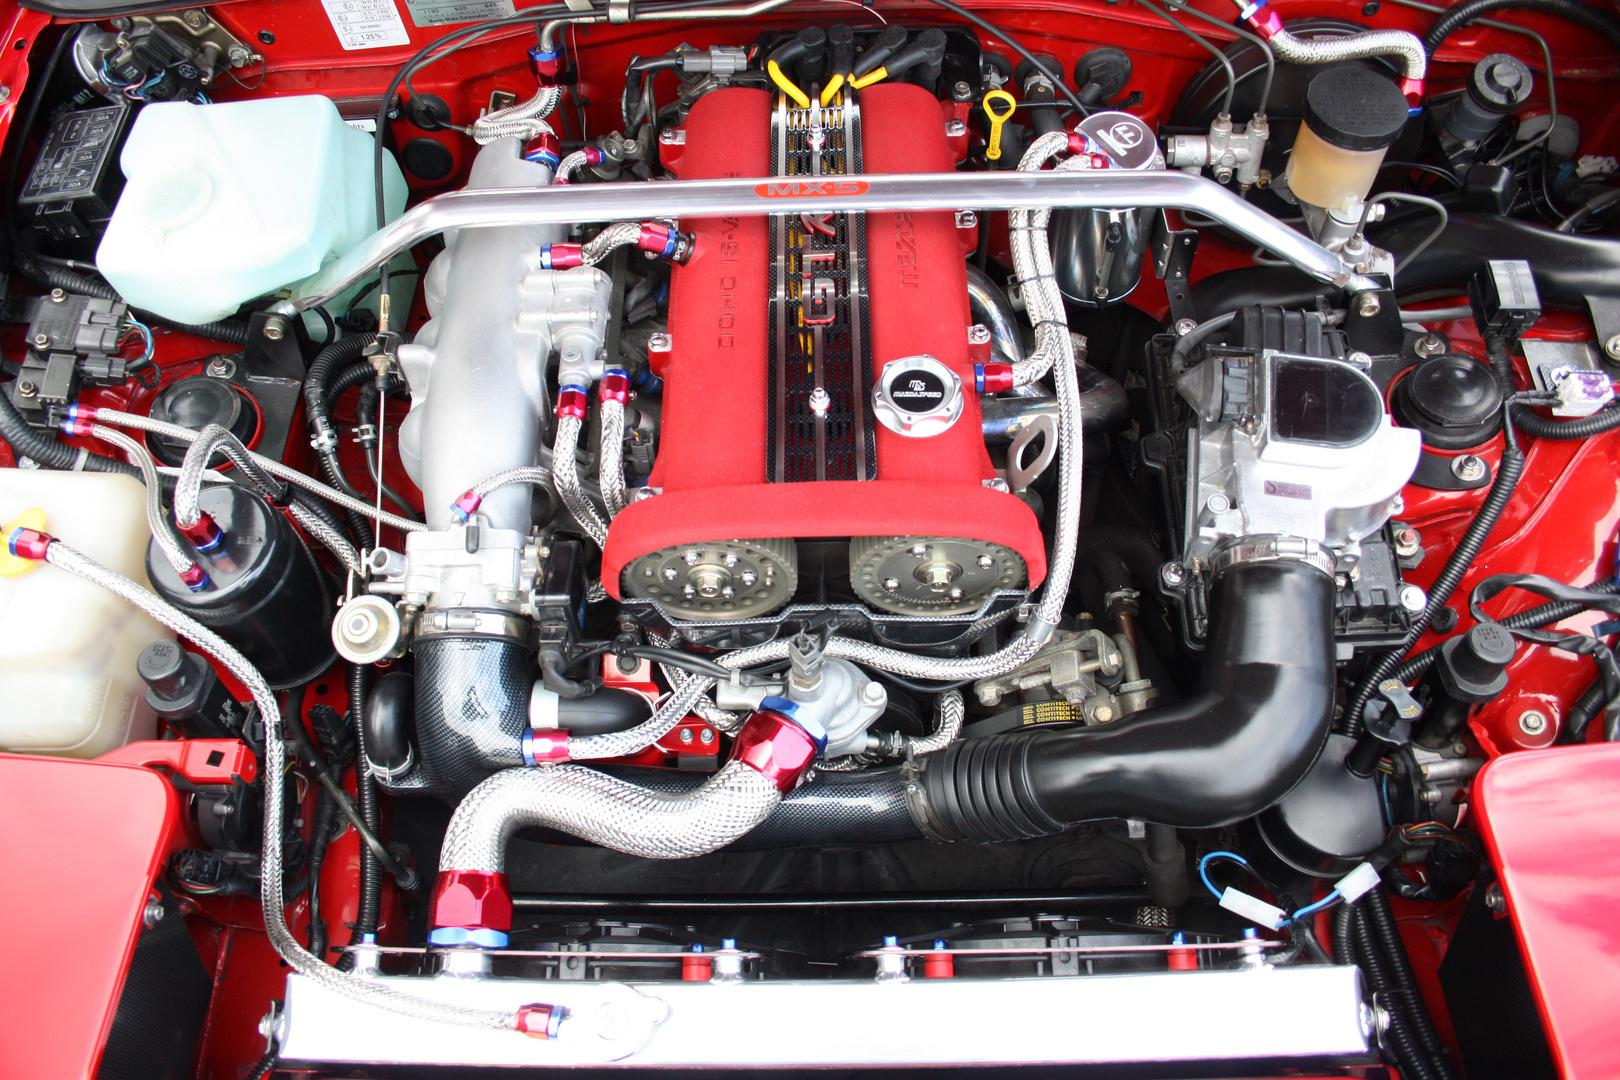 MX 5 Miata Detailaufnahme eines getunten Motors